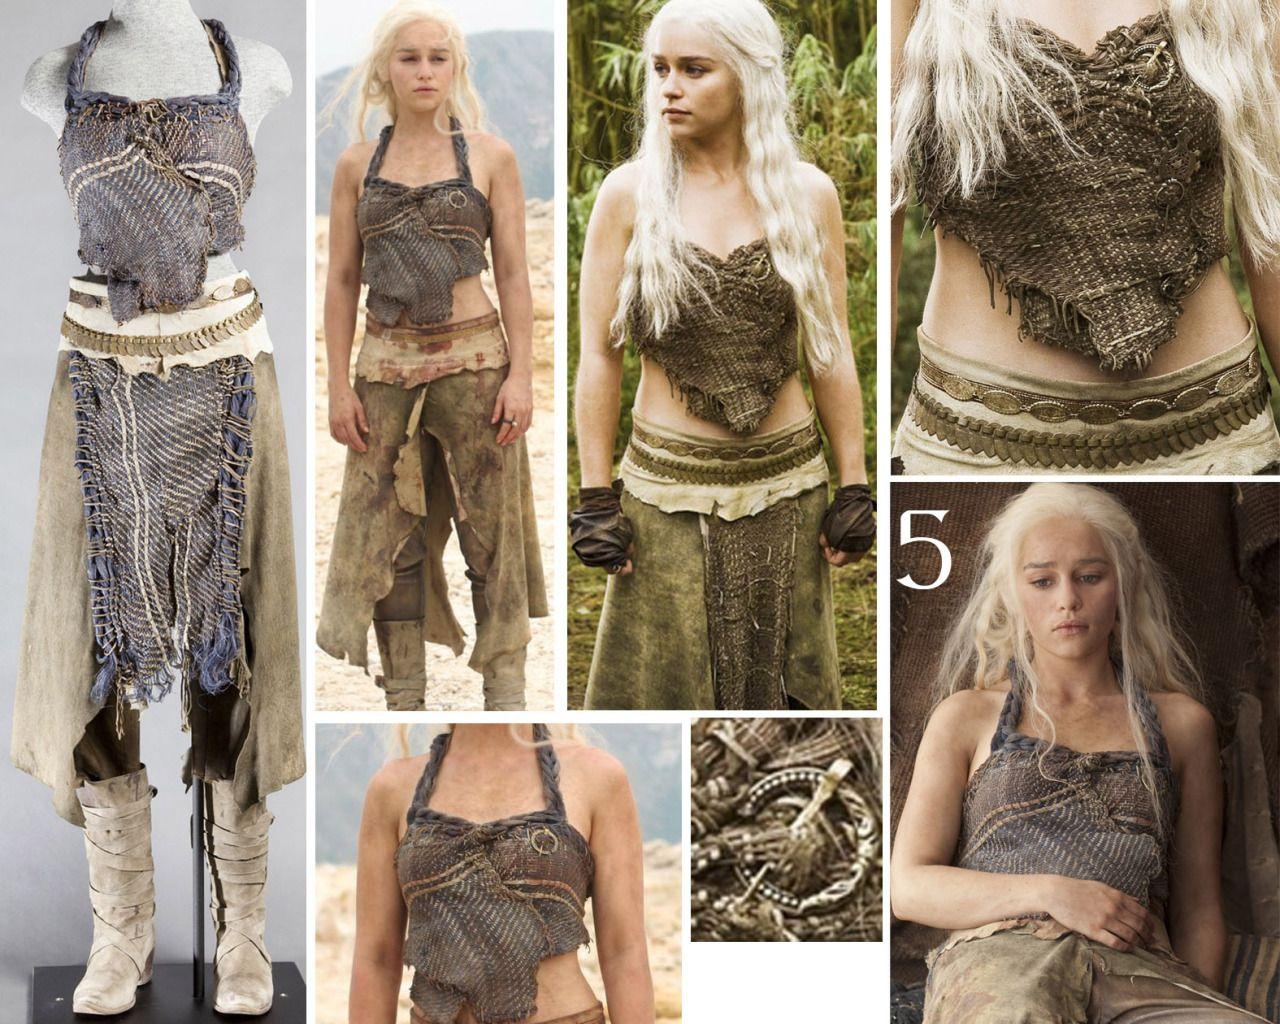 Daenerys Targaryen Cosplay Cosplay Outfits Daenerys